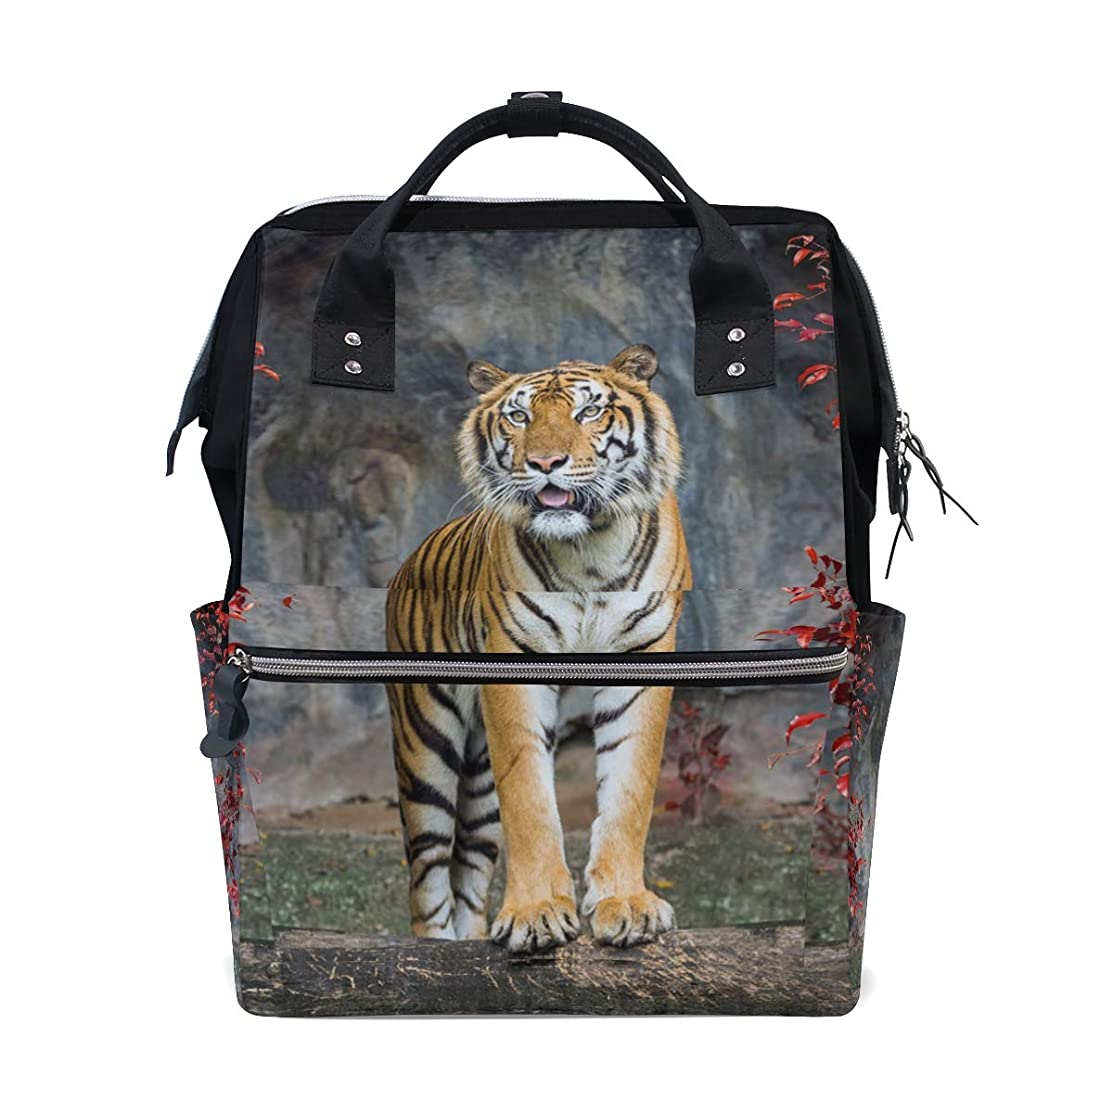 Tiger Red Tree School Backpack Large Capacity Mummy Bags Laptop Handbag Casual Travel Rucksack Satchel For Women Men Adult Teen Children